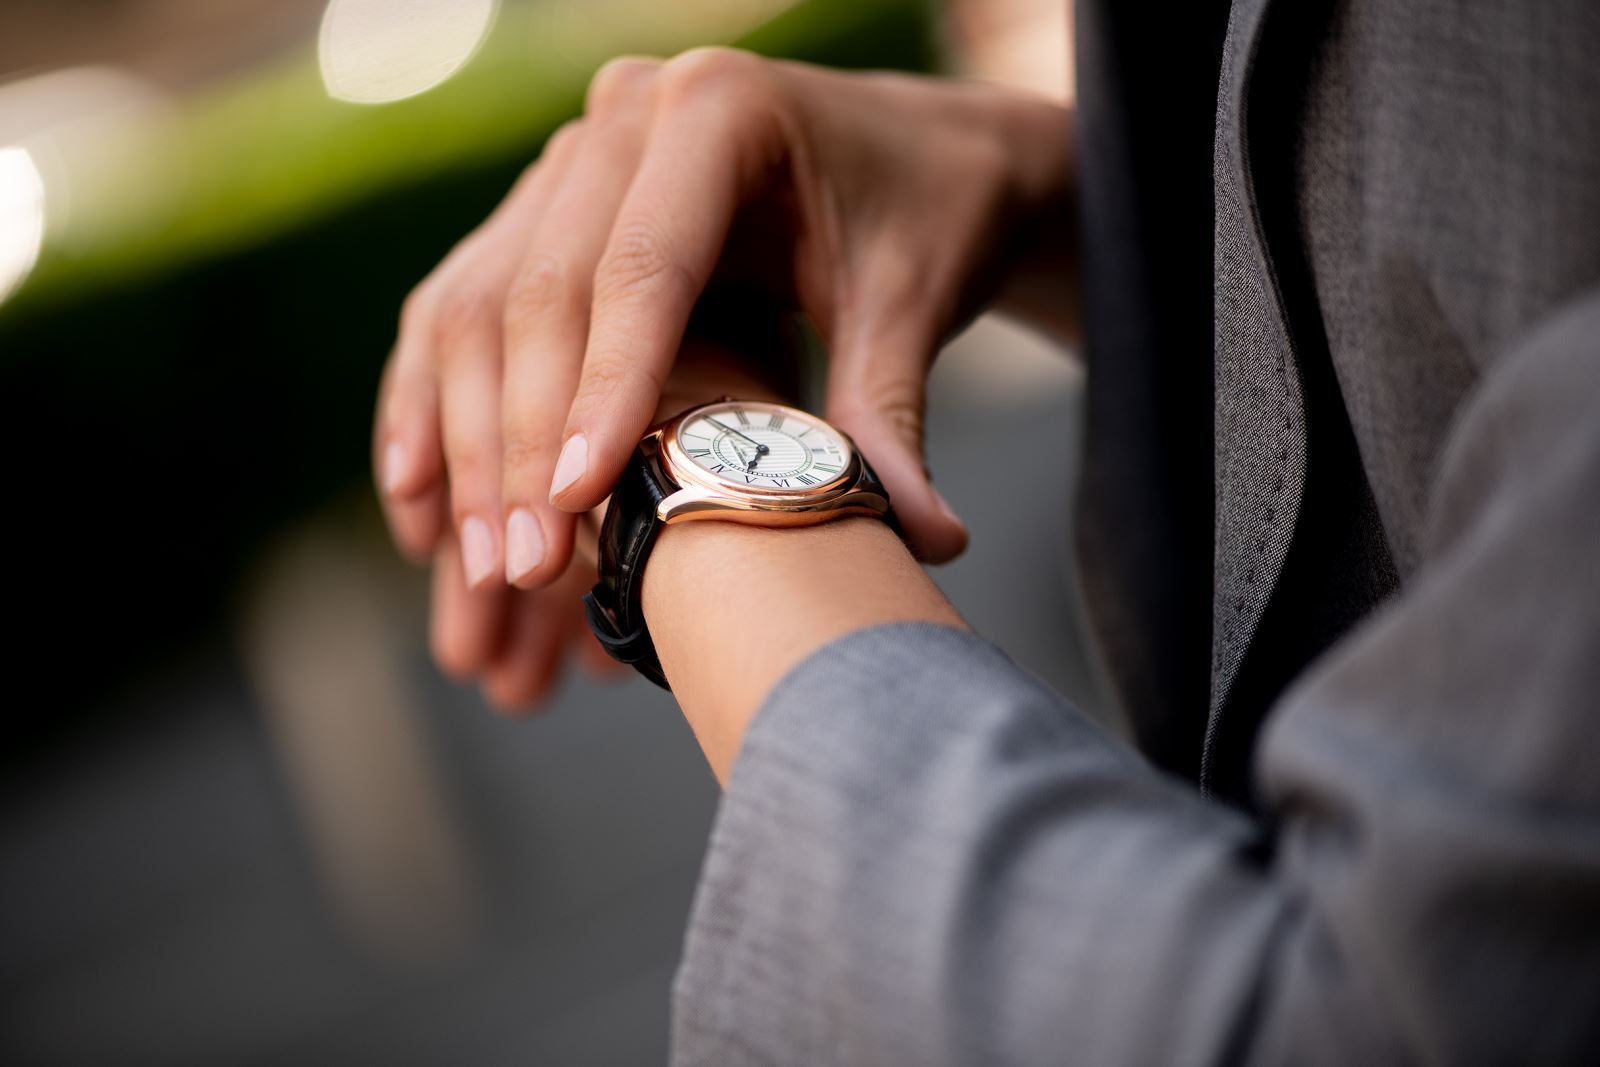 giới thiệu đồng hồ Frederique Constant nữ mới 2020